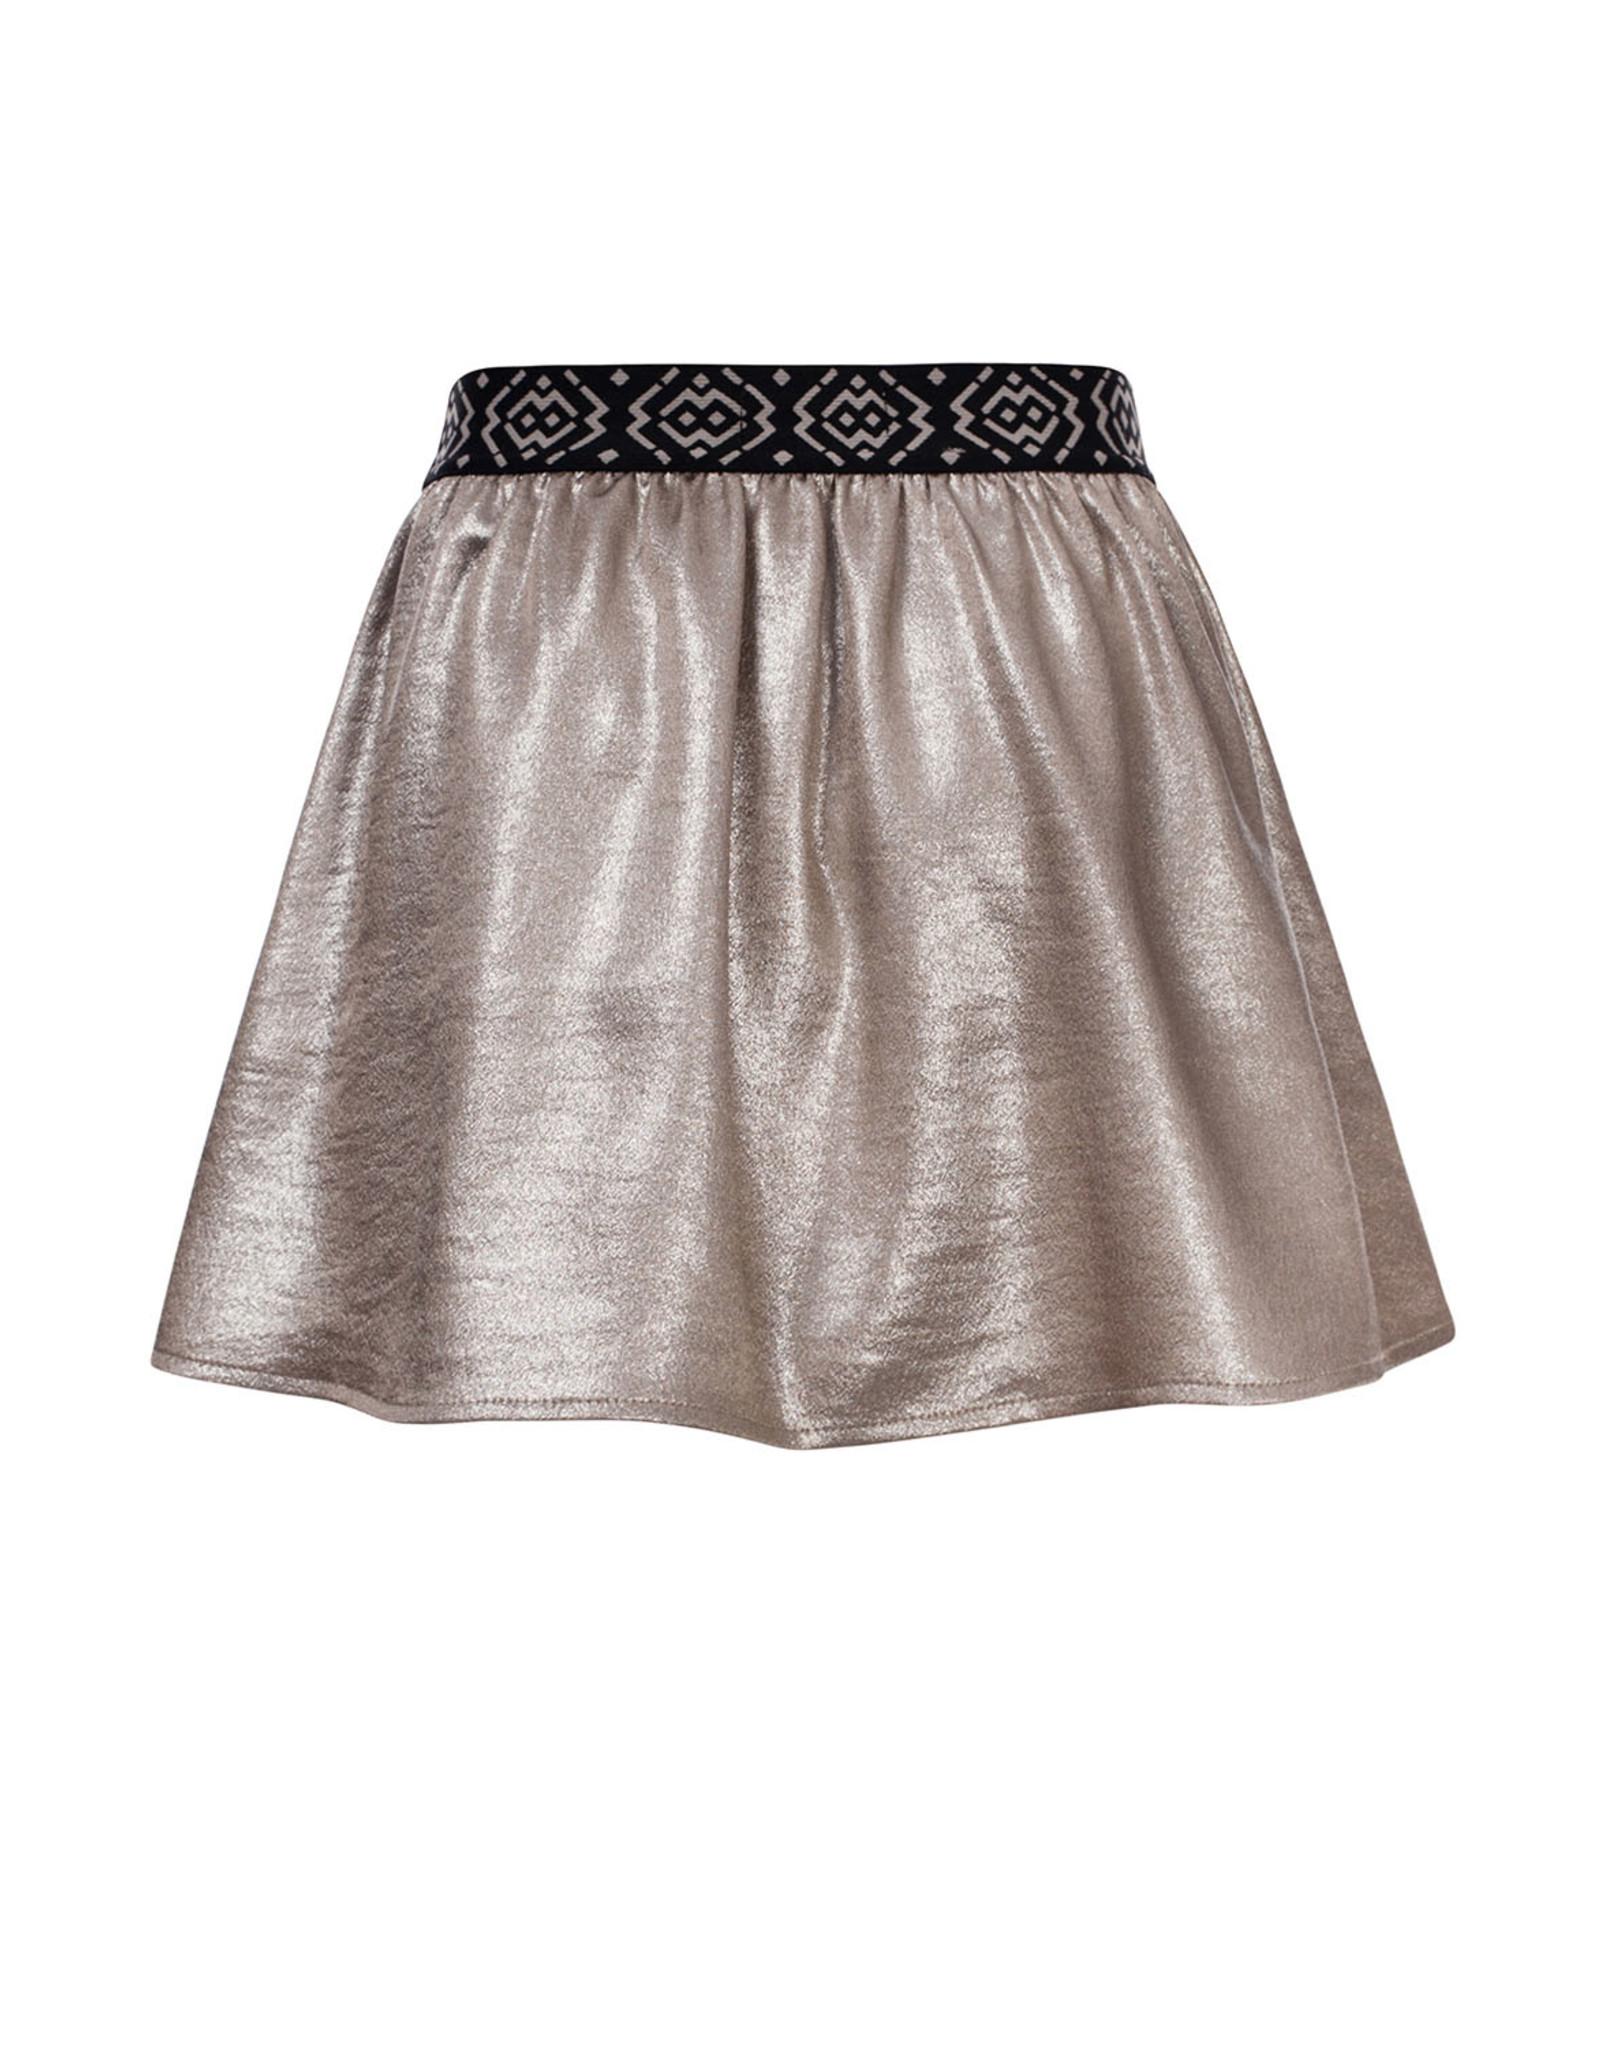 Looxs 10Sixteen woven metallic skirt White silver